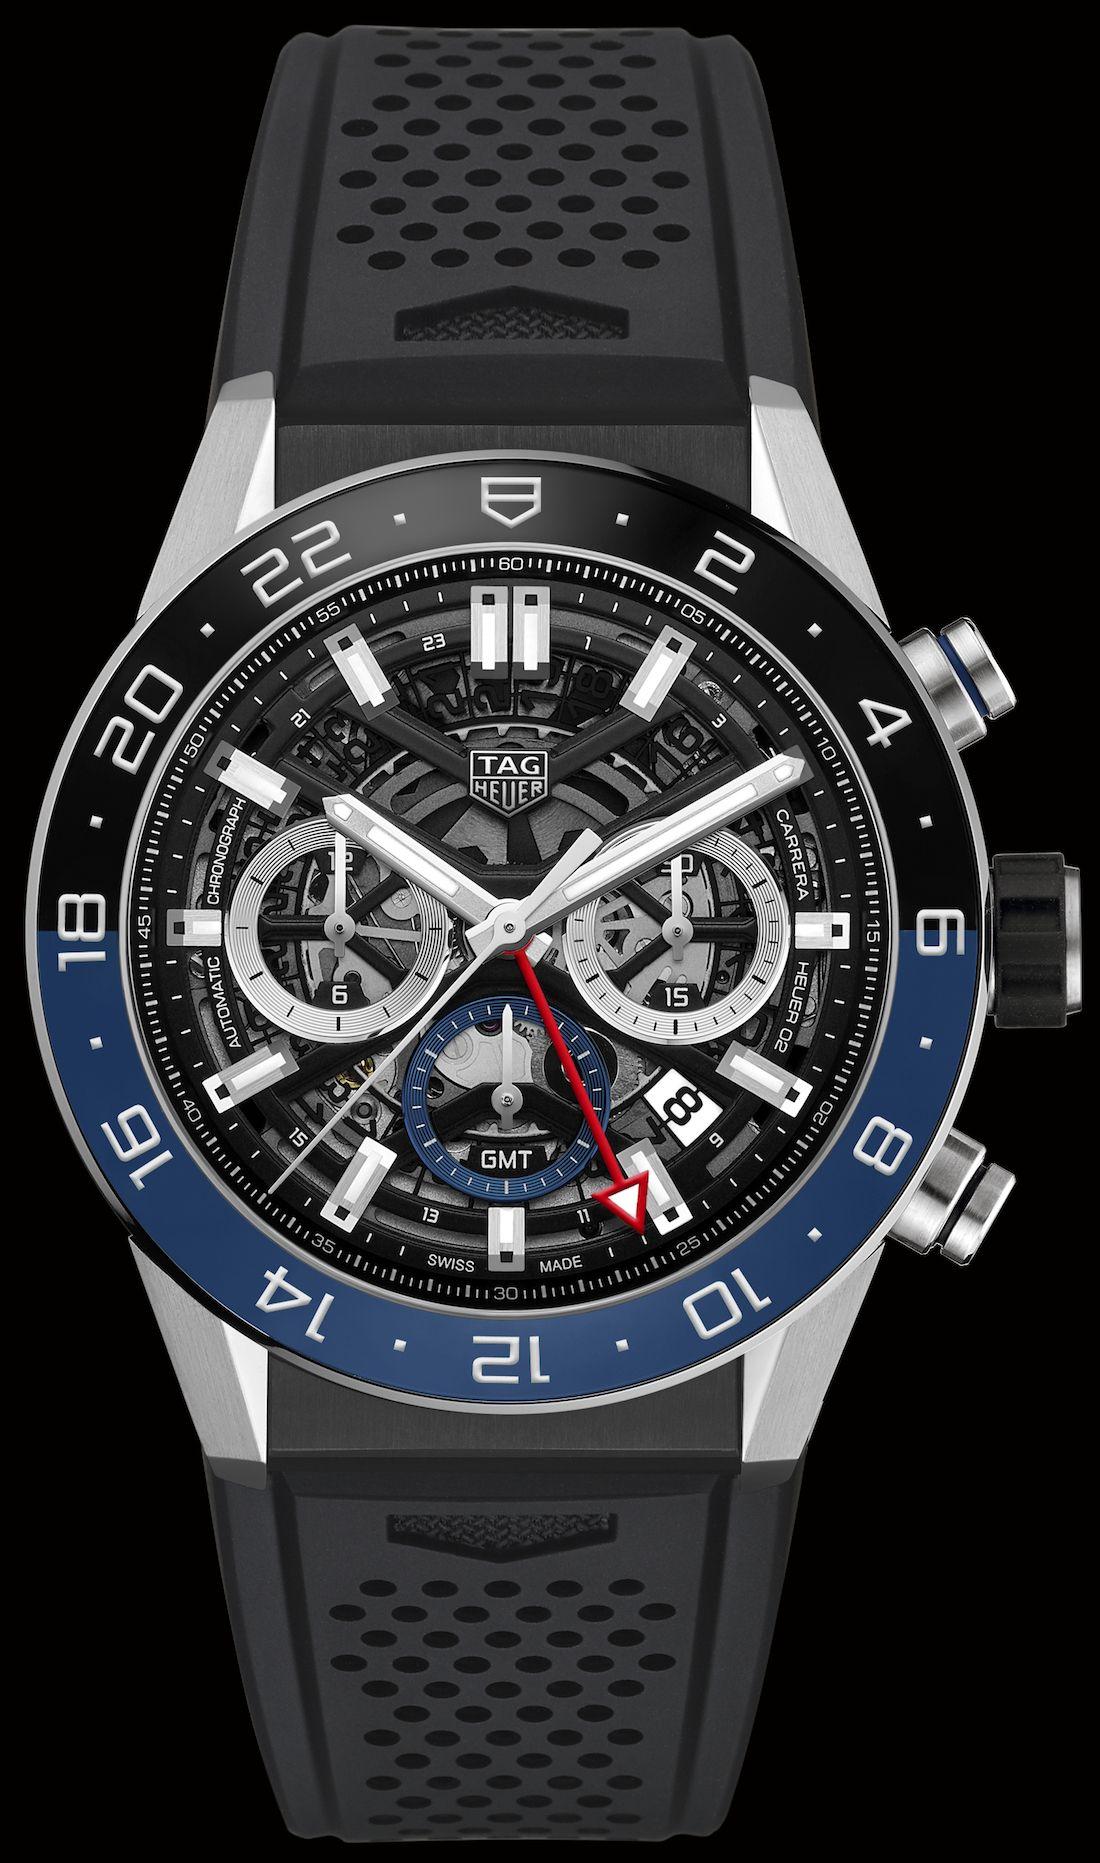 e56ccc1212b9d TAG Heuer Carrera Chronograph GMT Watch  baselworld2018  baselworldabtw